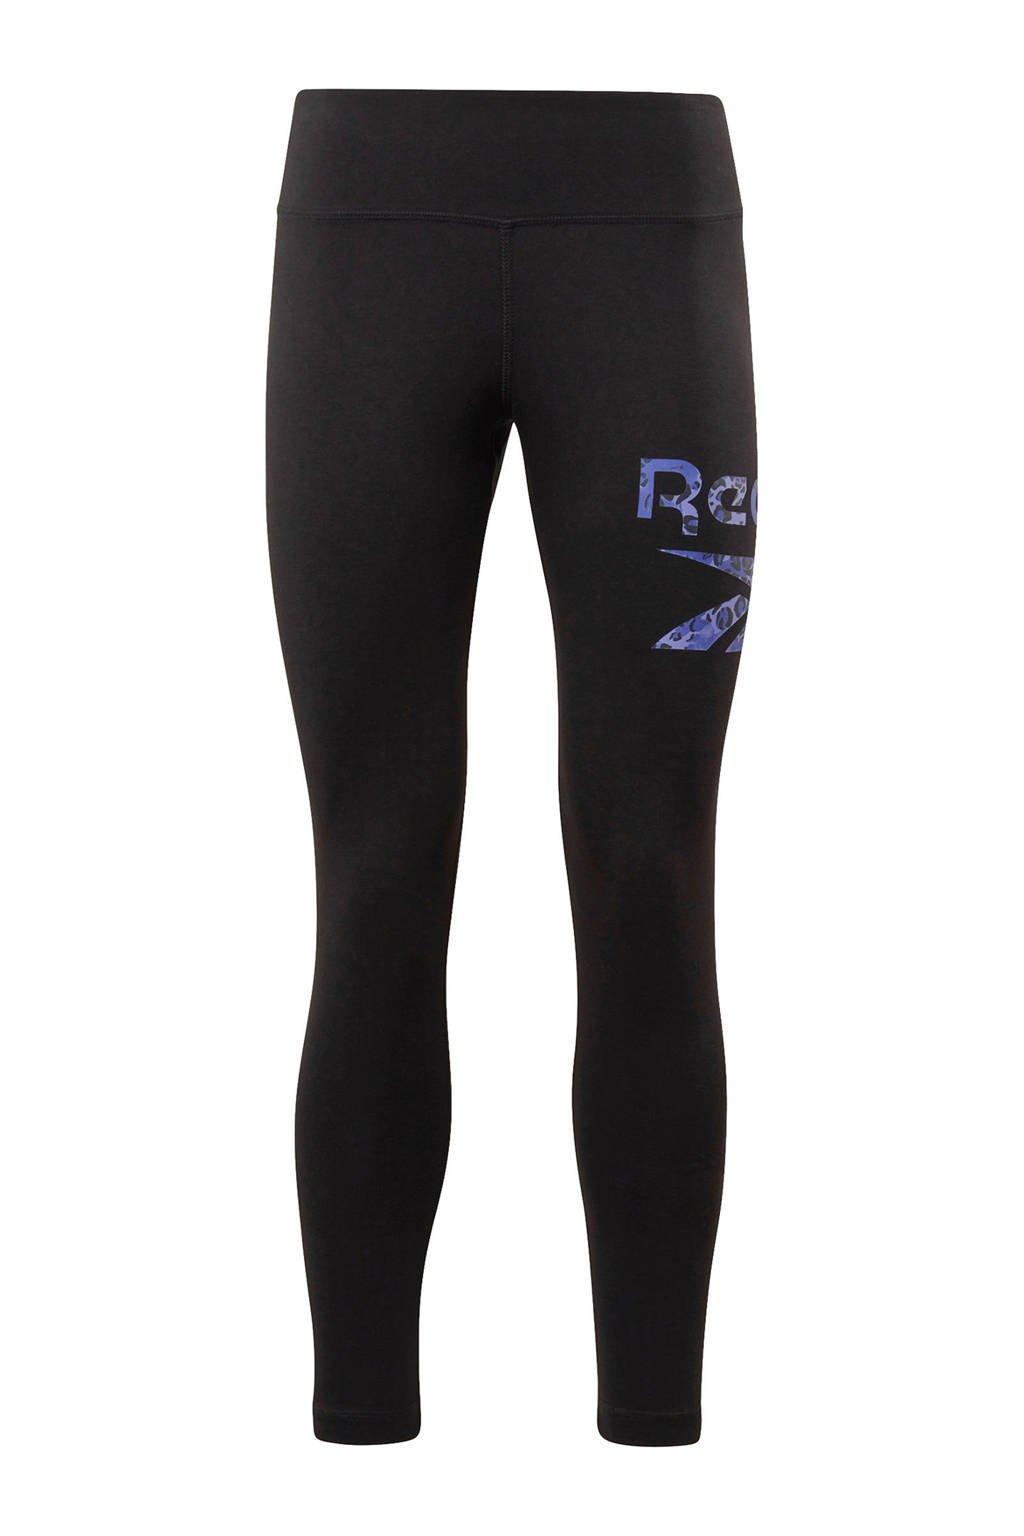 Reebok Training 7/8 sportlegging zwart/paars, Zwart/paars